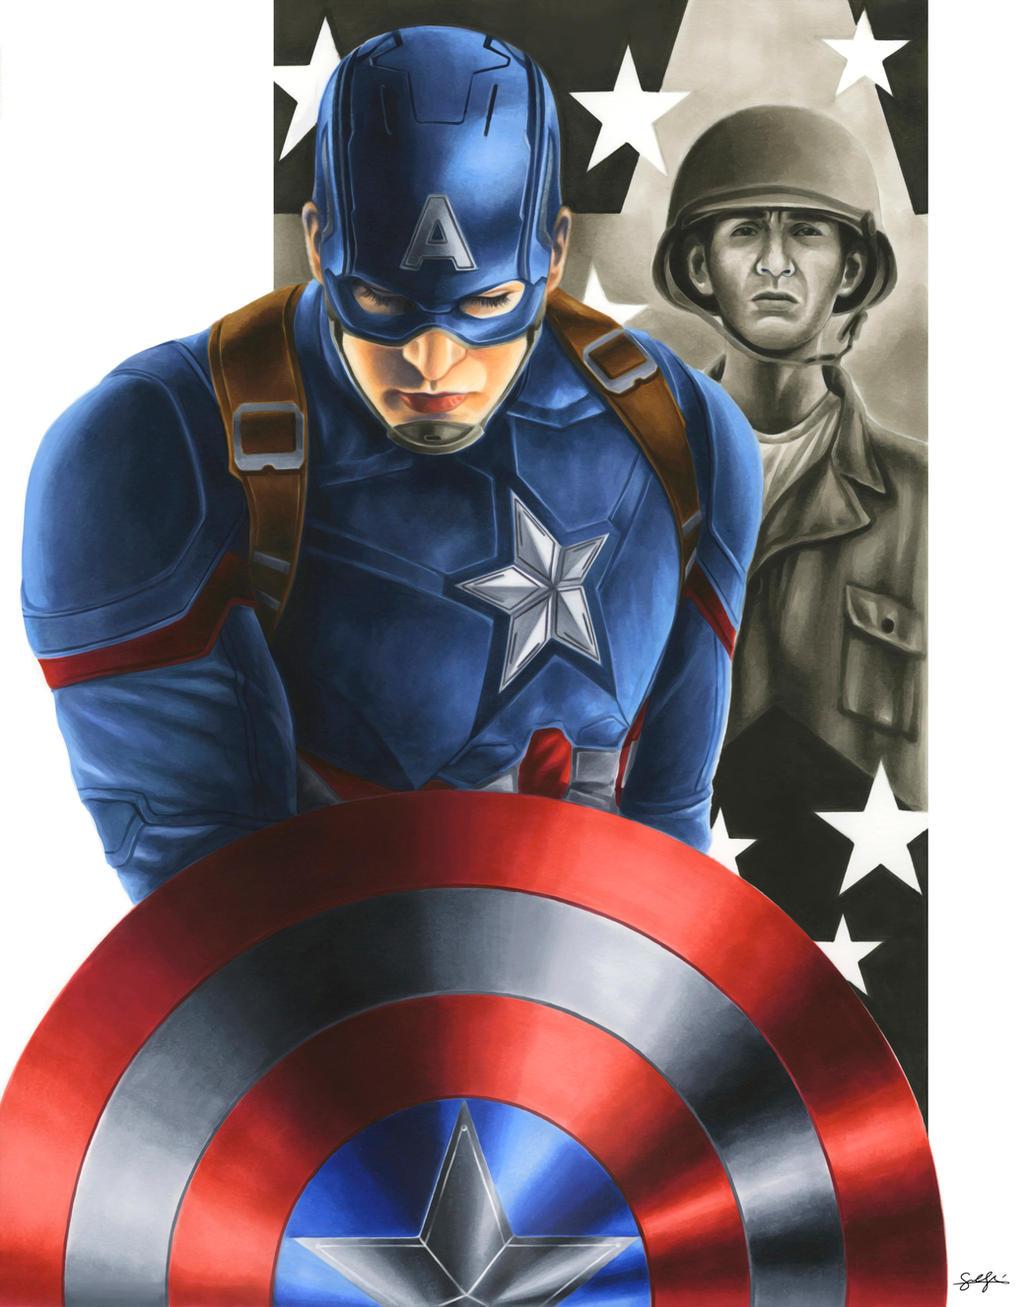 Civil War: Captain America by smlshin